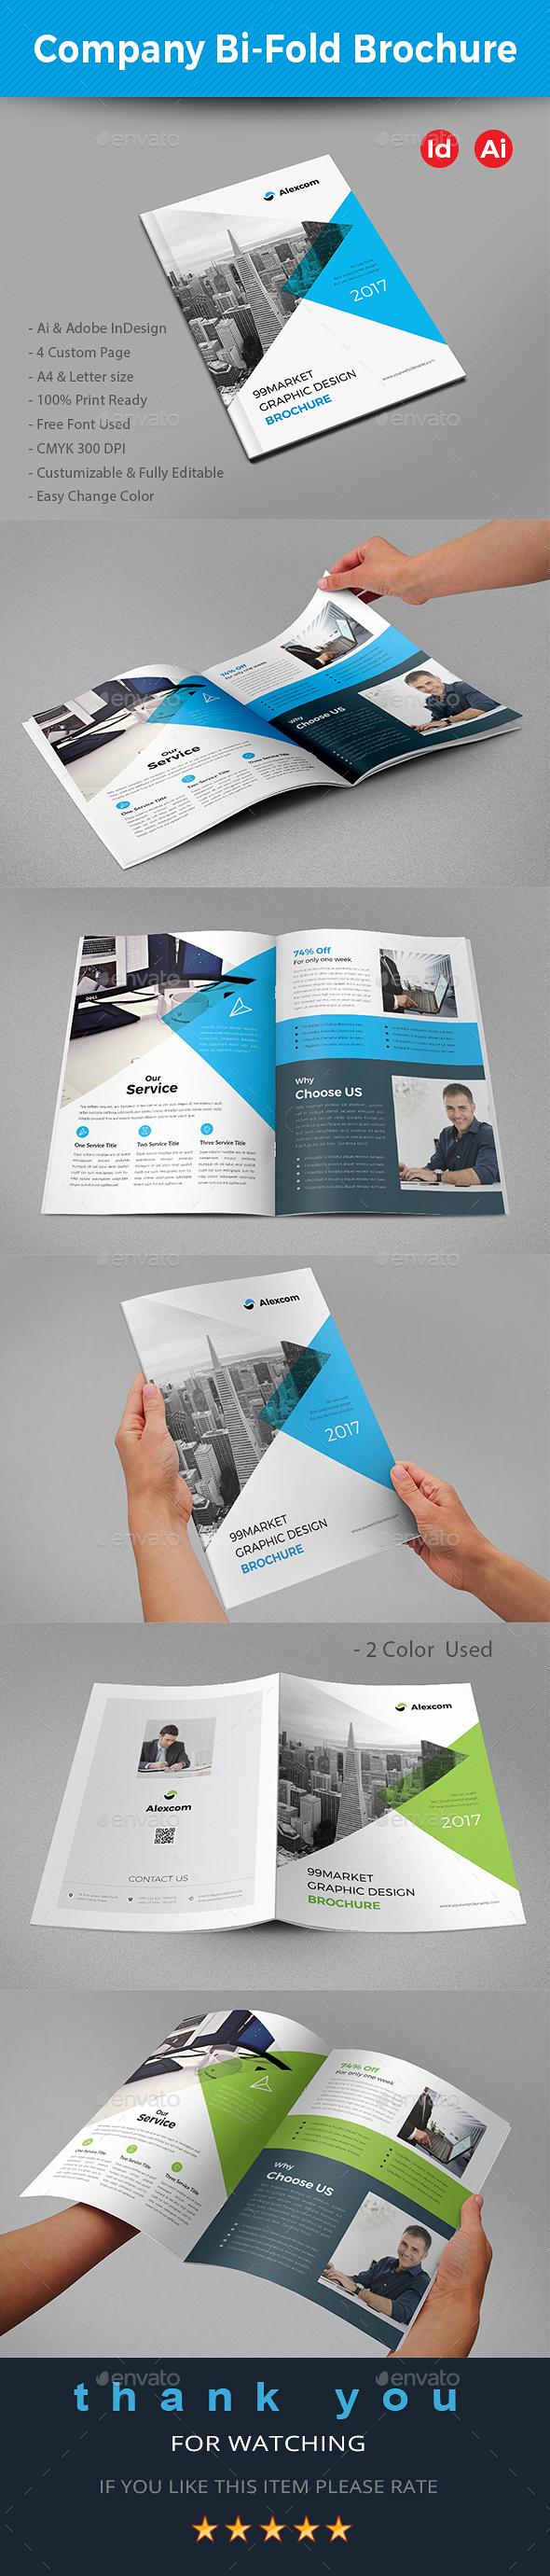 GraphicRiver Company Bi-Fold Brochure 20947752